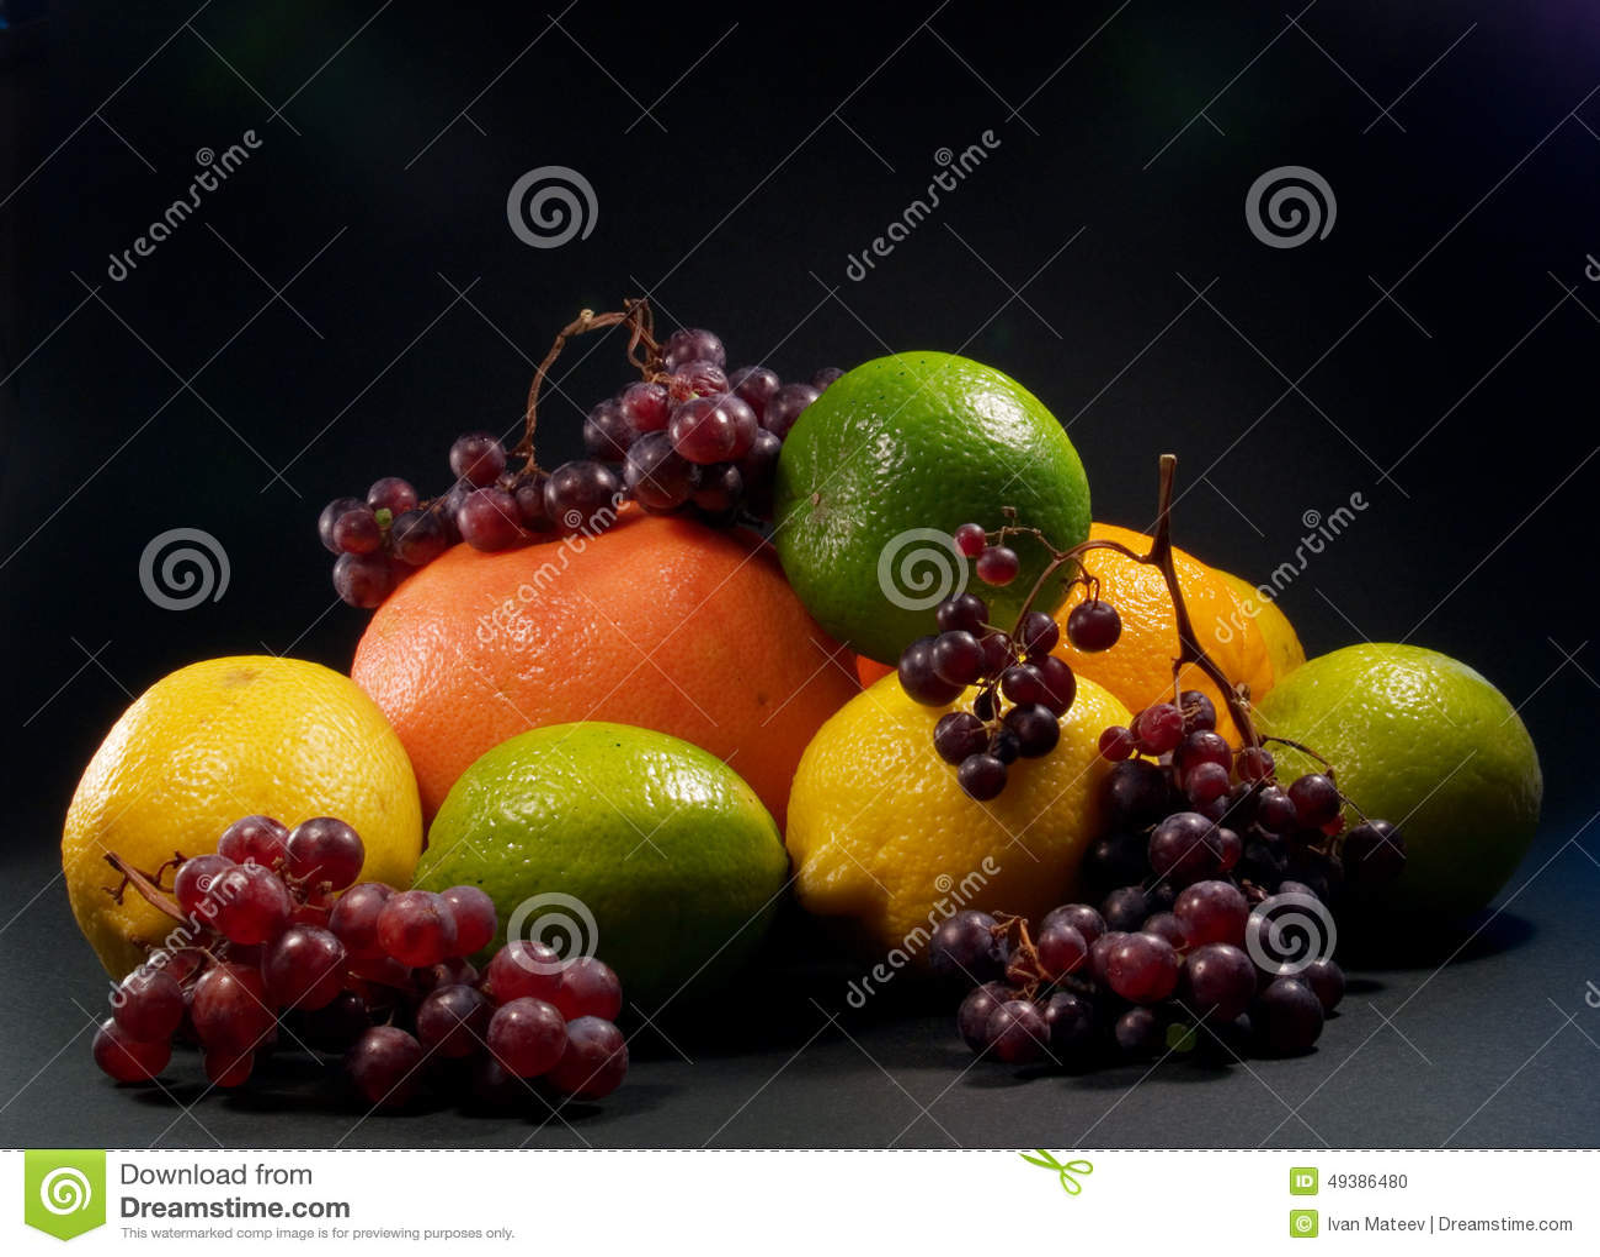 Fruits Still Life Stock Photo - Image: 49386480